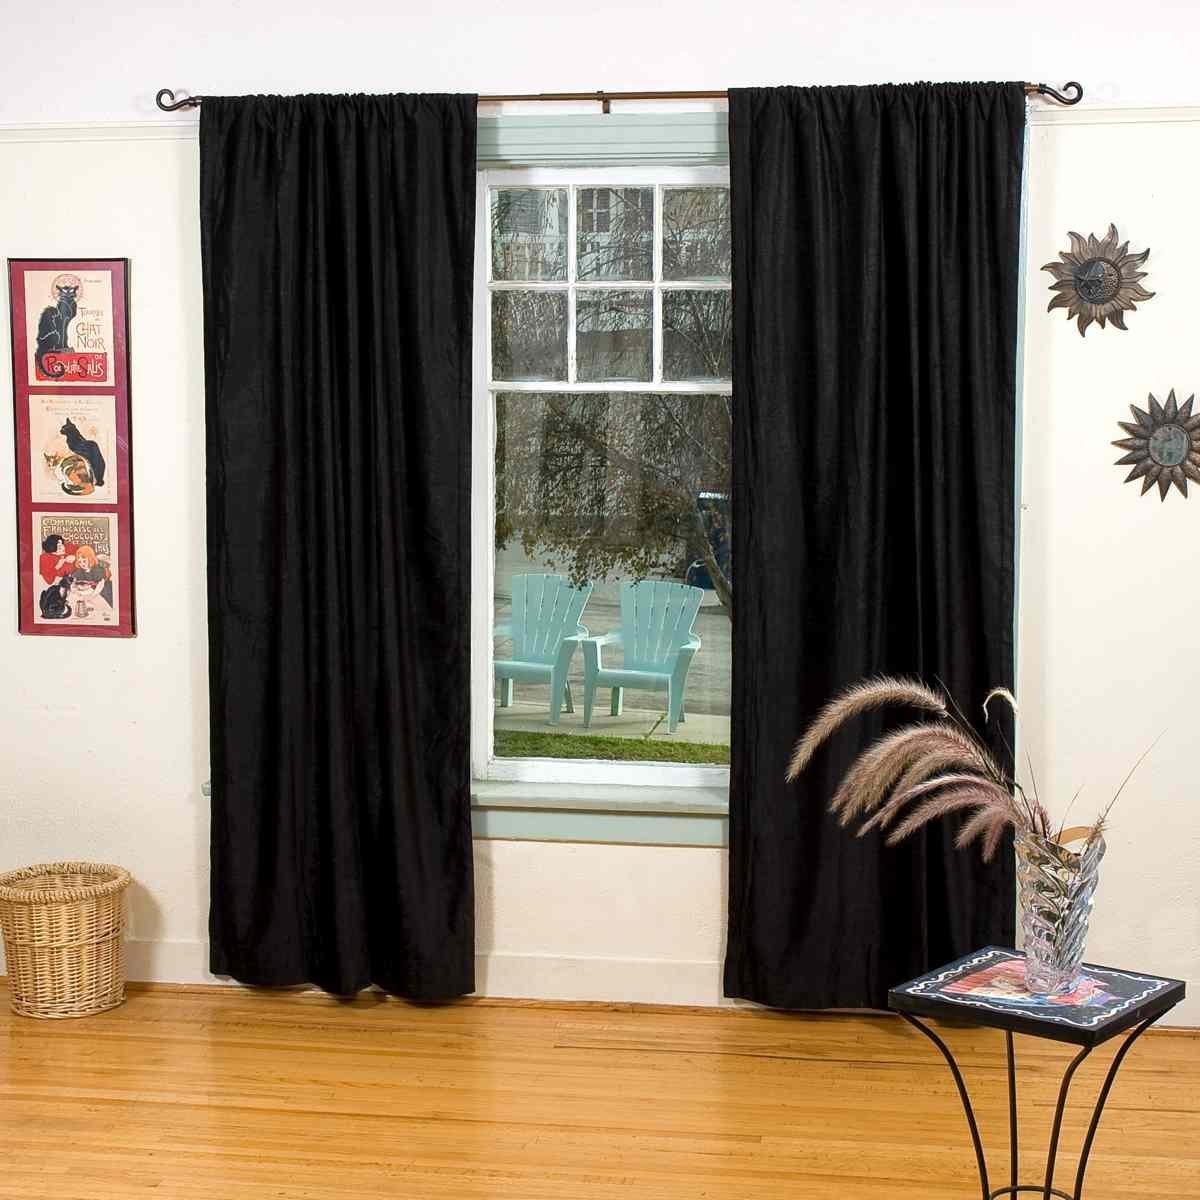 Indian Selections Lined-Black Rod Pocket Velvet Cafe Curtain/Drape/Panel - 43W x 24L - Piece